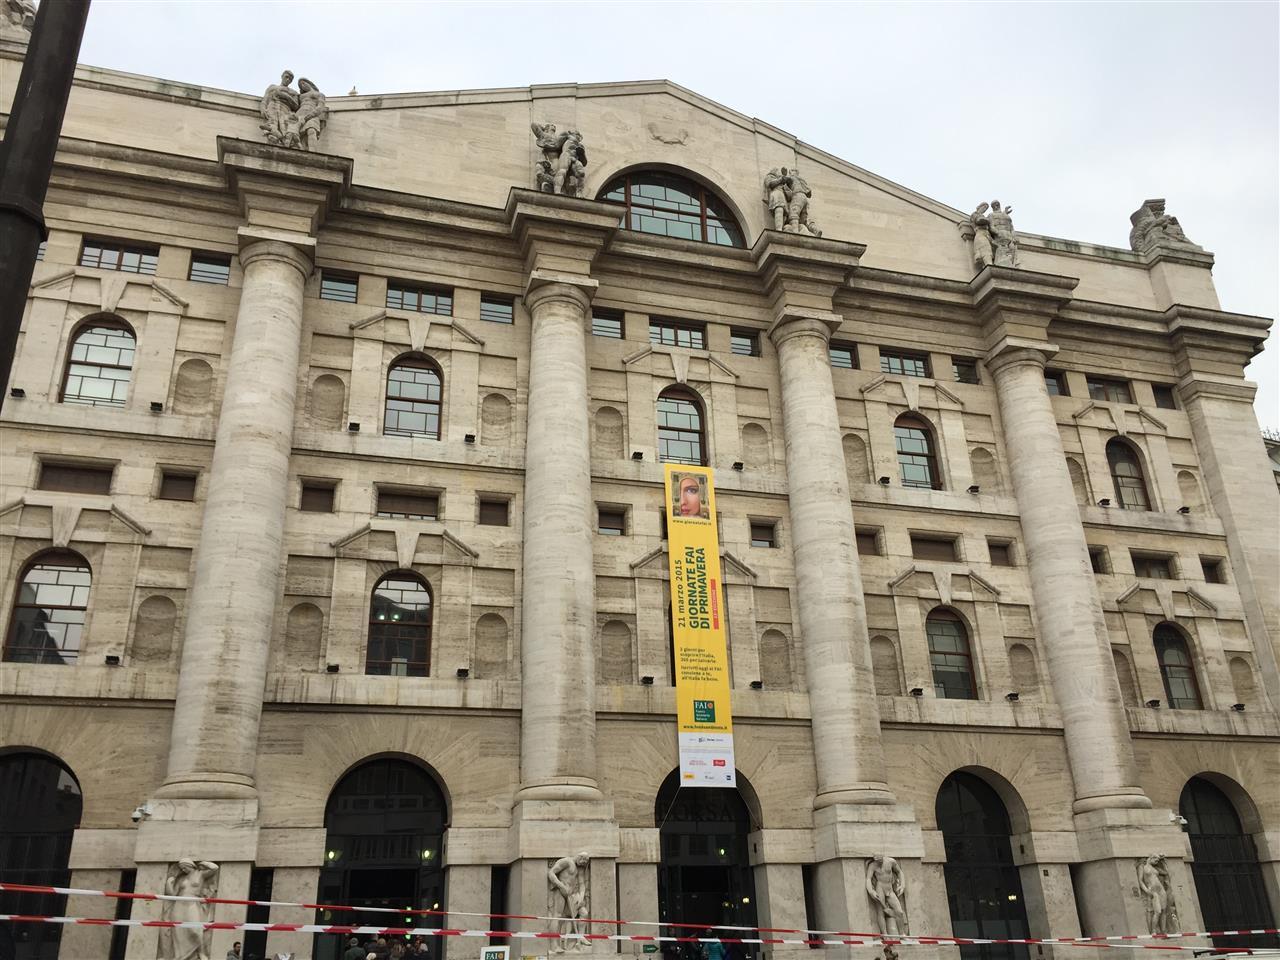 #PalazzoMezzanotte, Headquarter of the Stock Exchange in #Milano